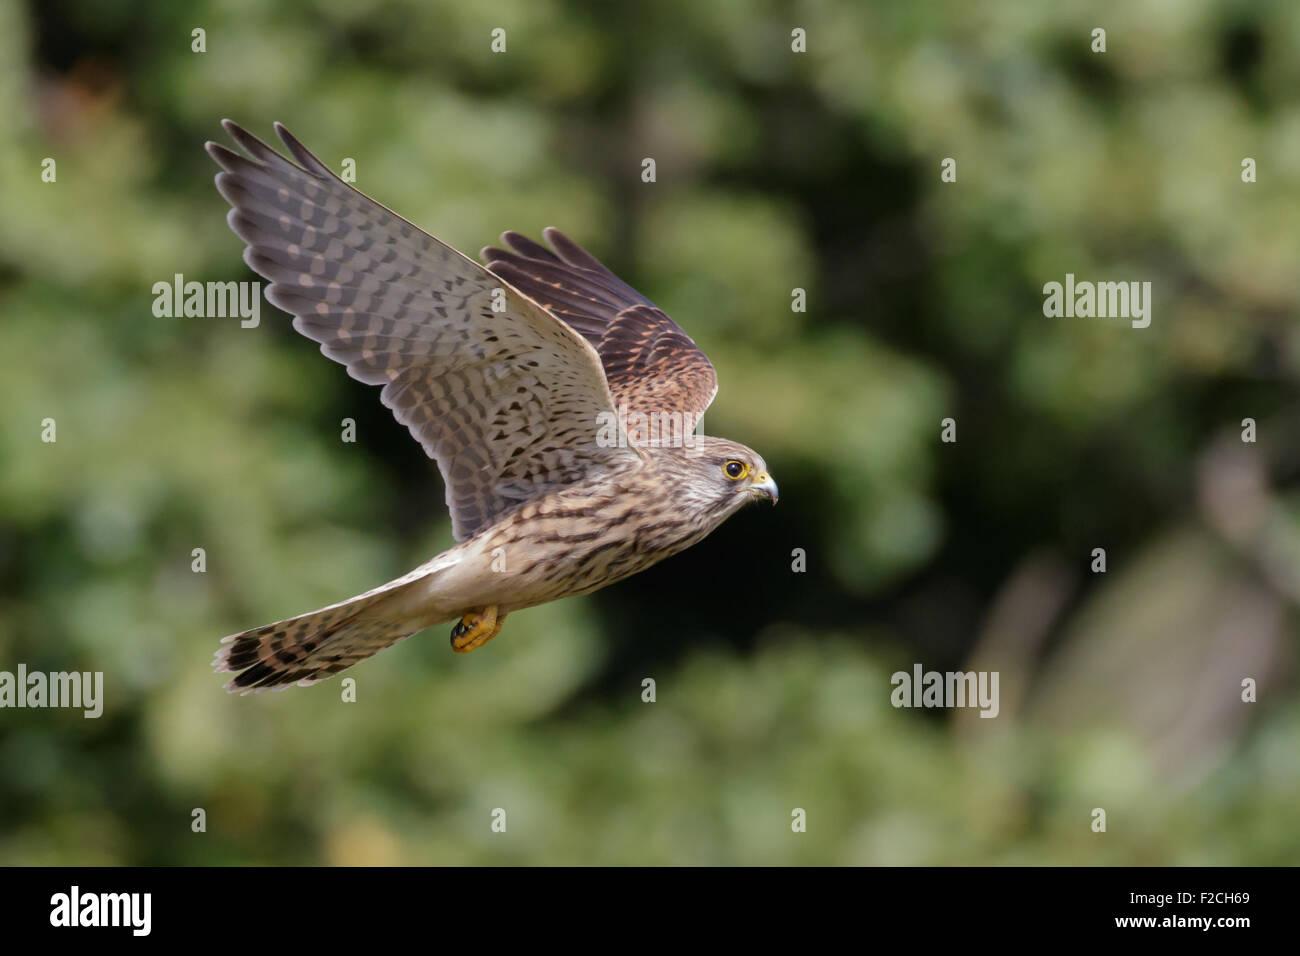 Common Kestrel (Falco tinnunculus) flying against trees Stock Photo